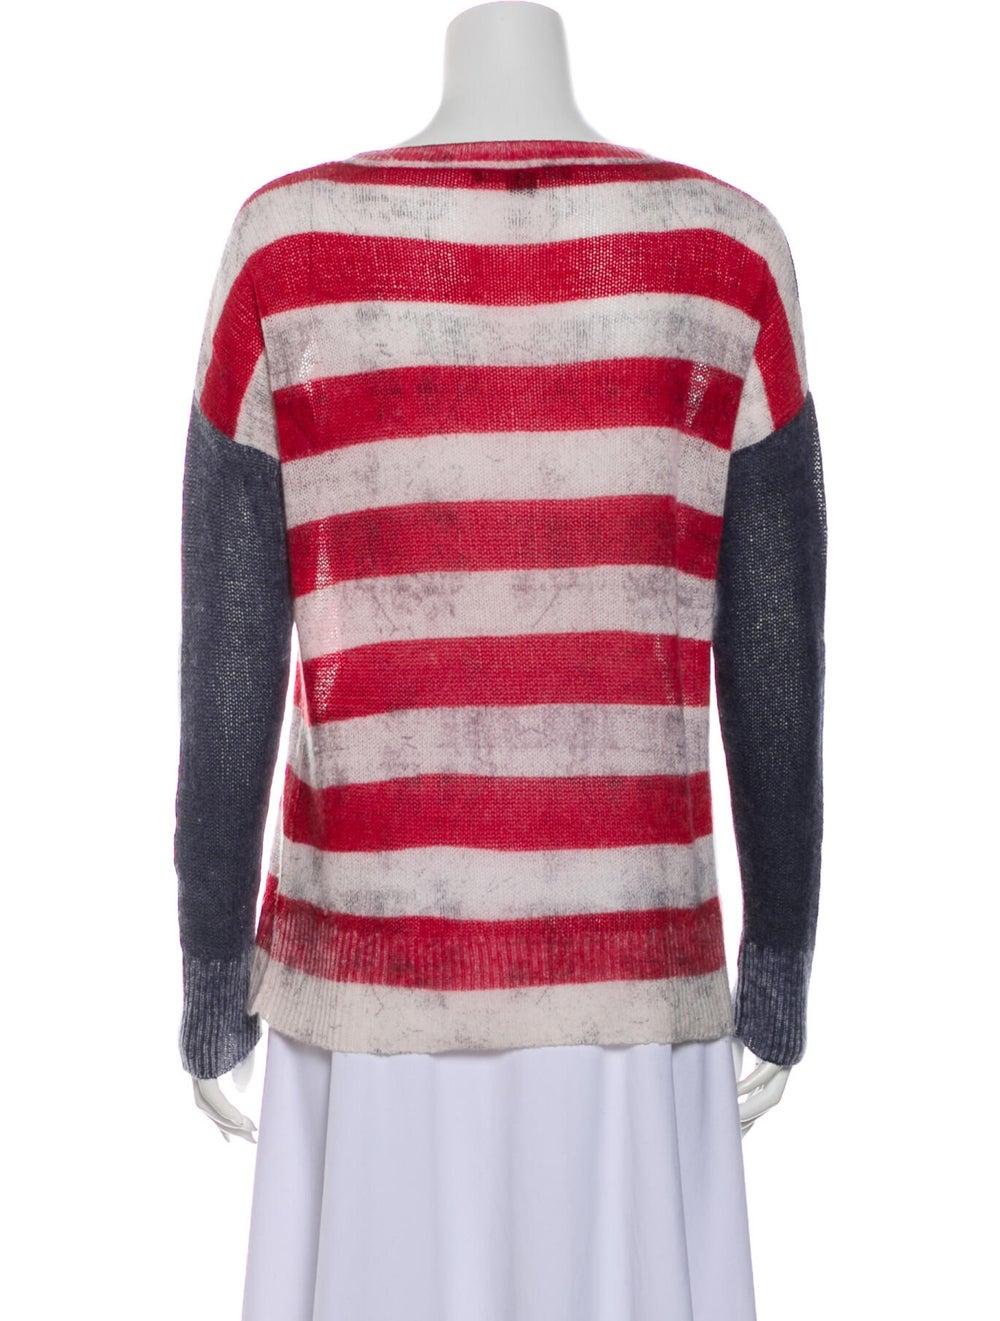 Skull Cashmere Cashmere Striped Sweater - image 3